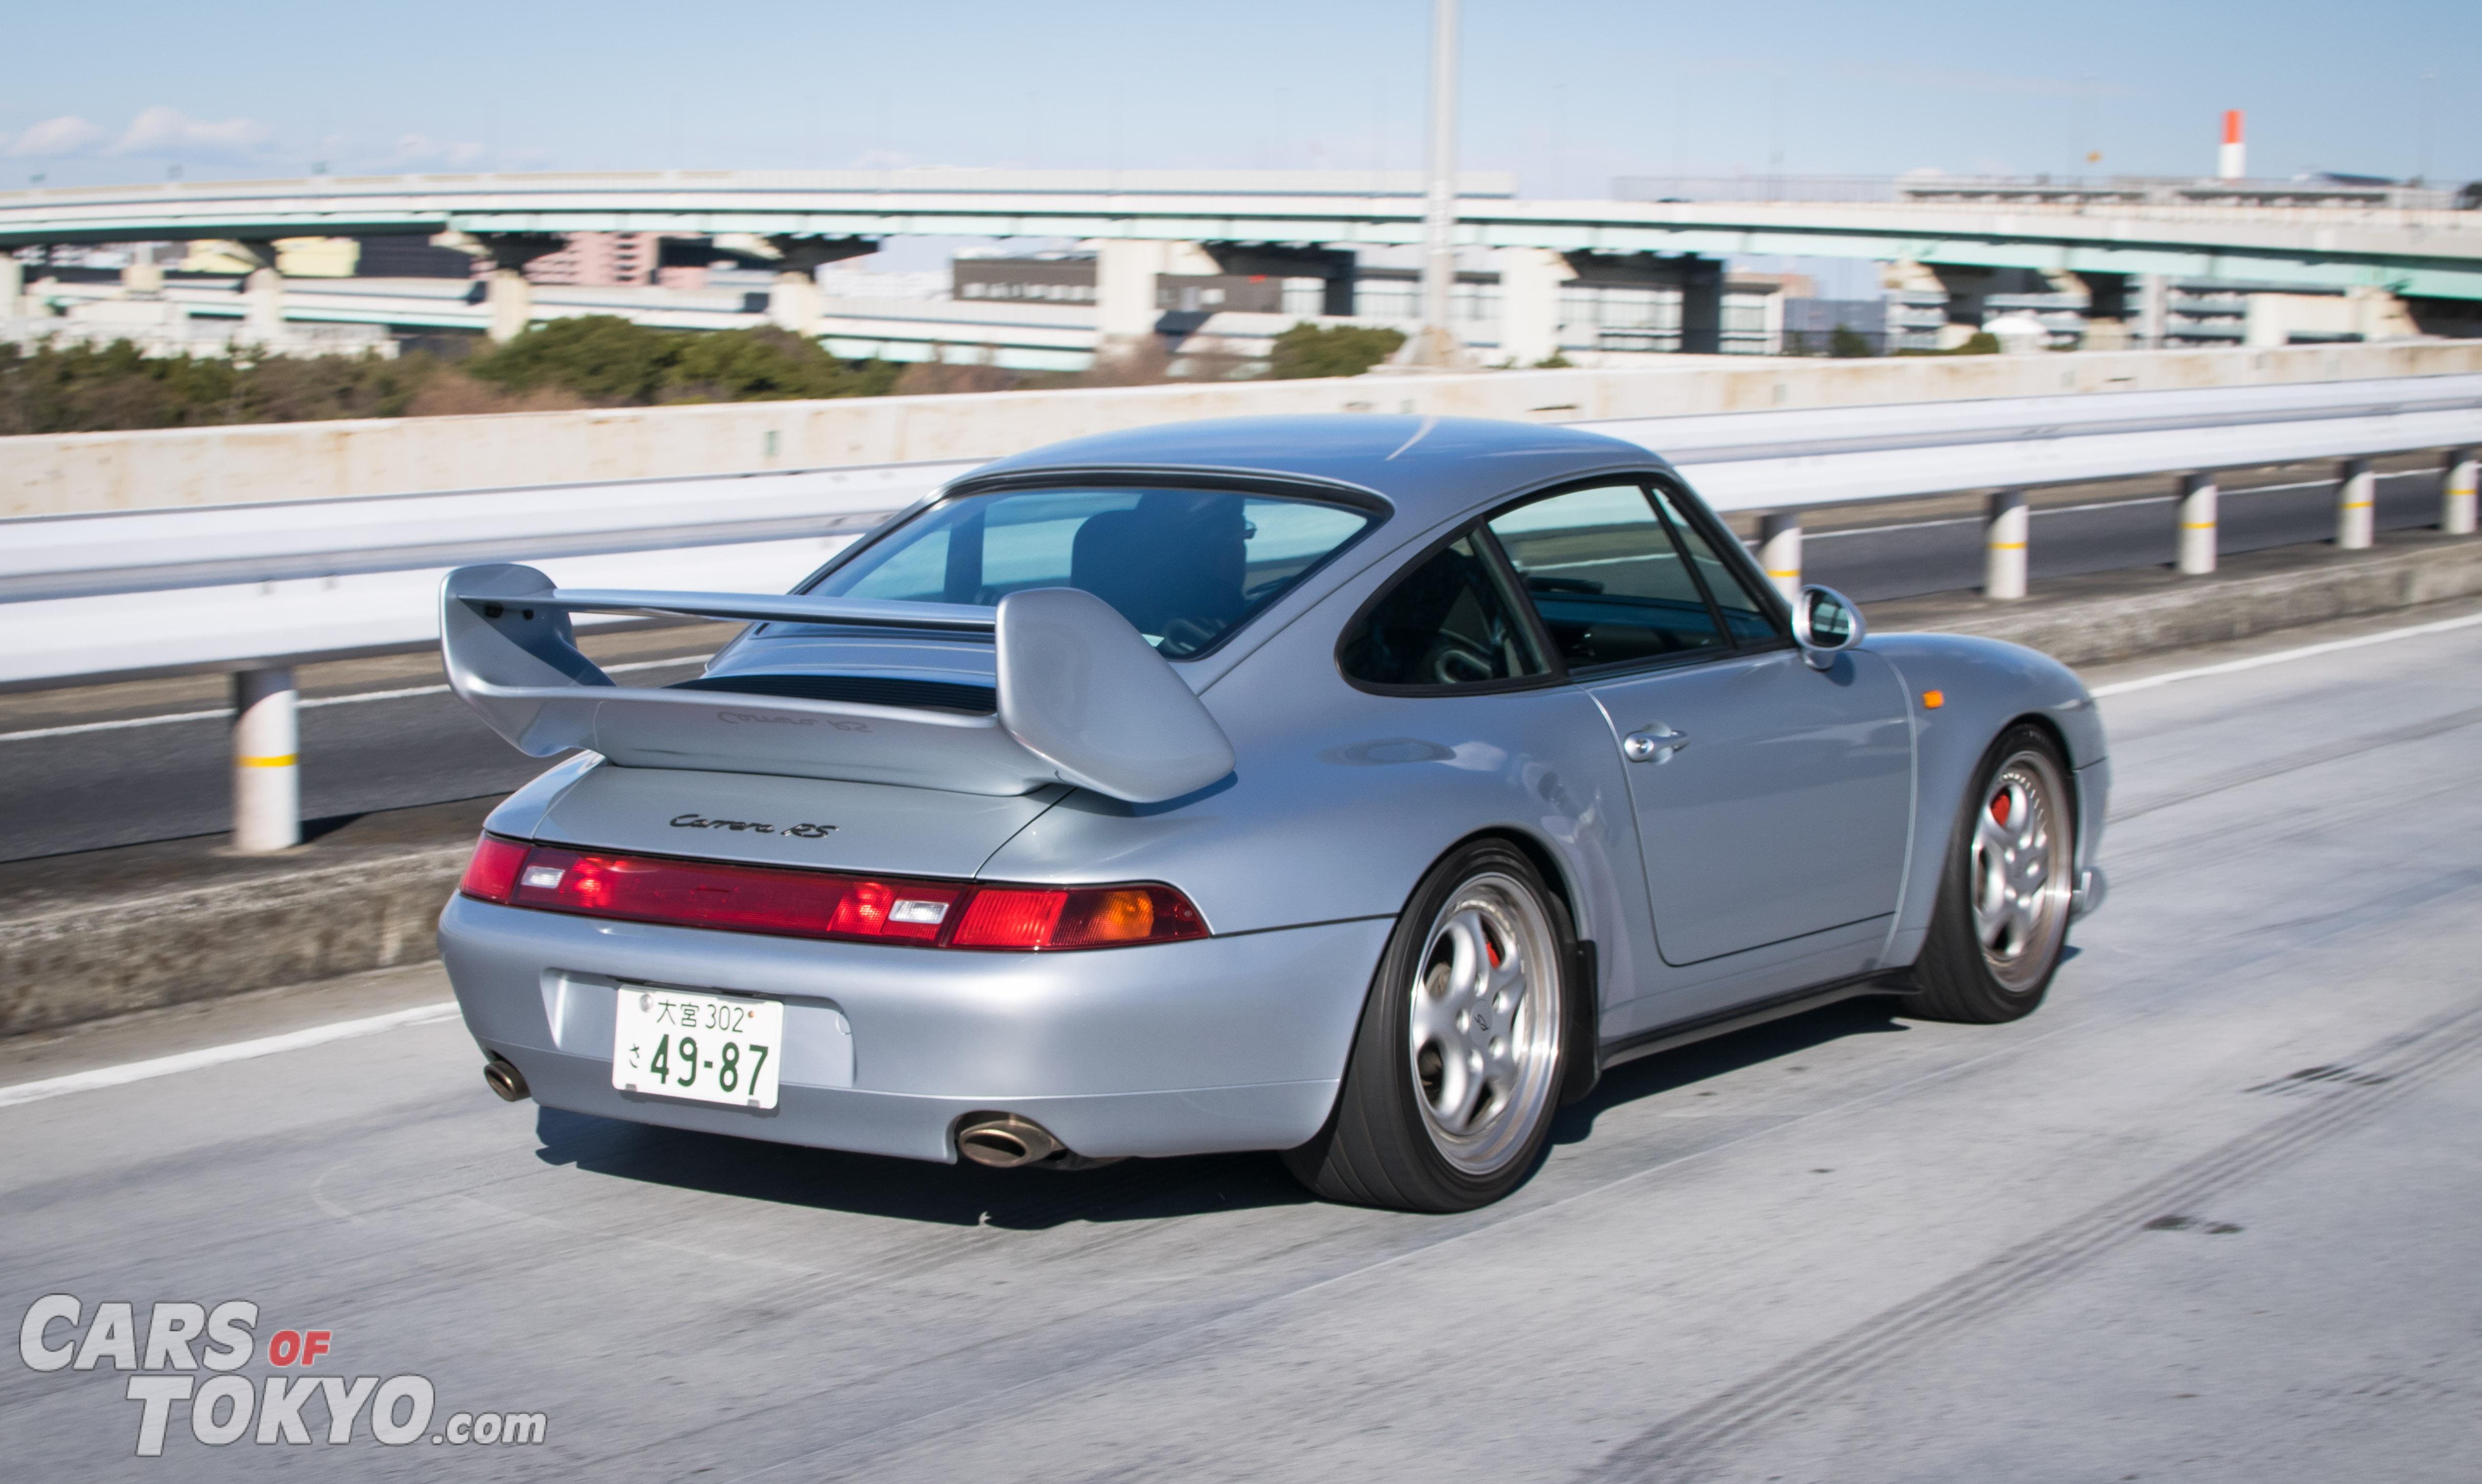 Cars of Tokyo Porsche 911 Carrera RS 993